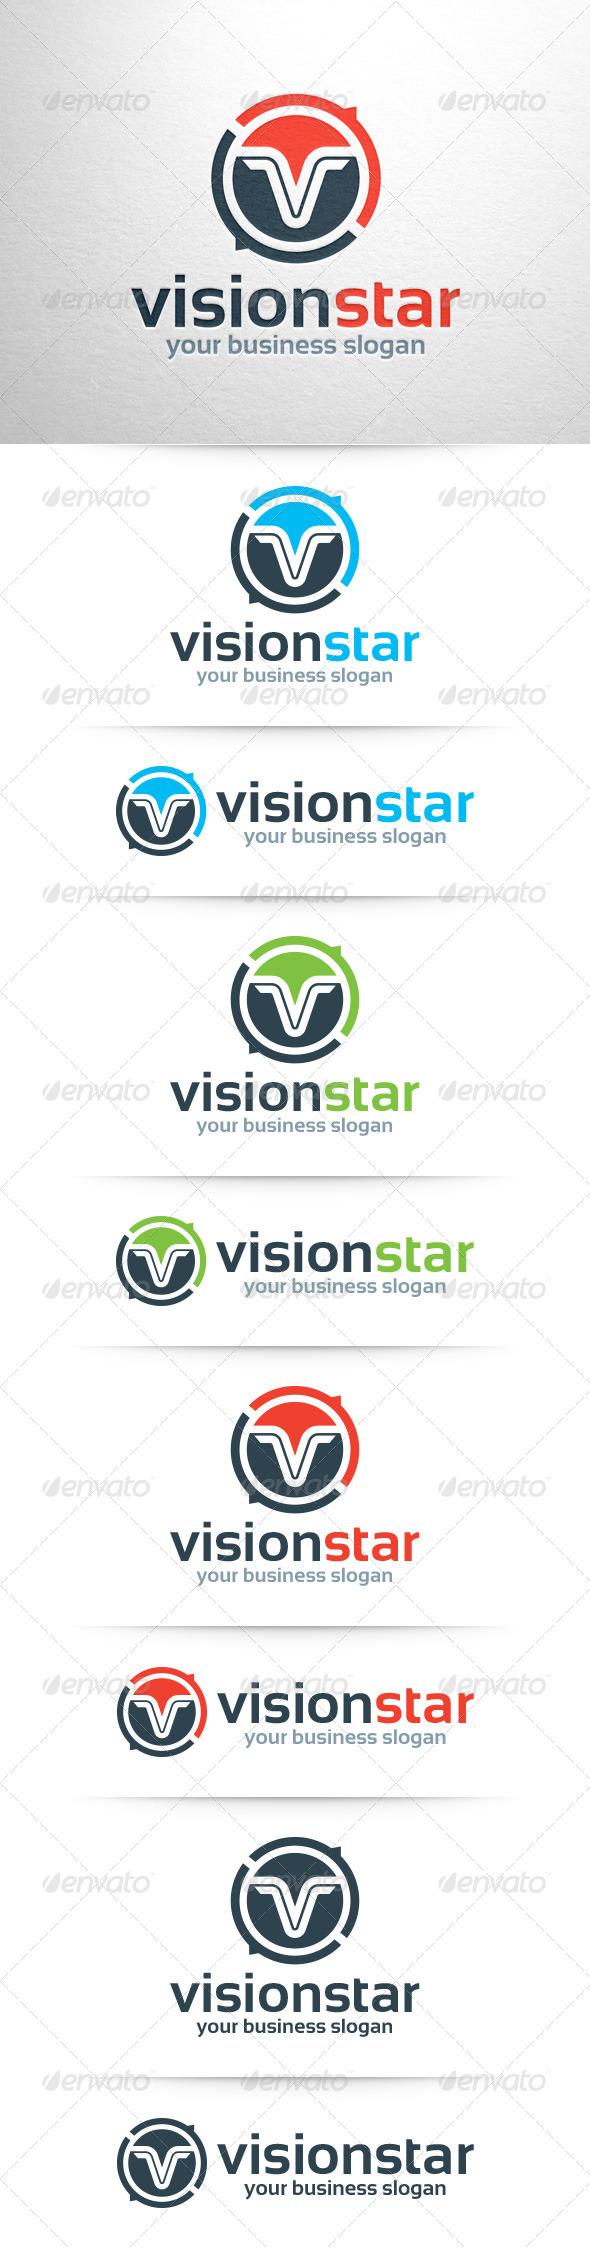 GraphicRiver Vision Star Letter V Logo 8164005